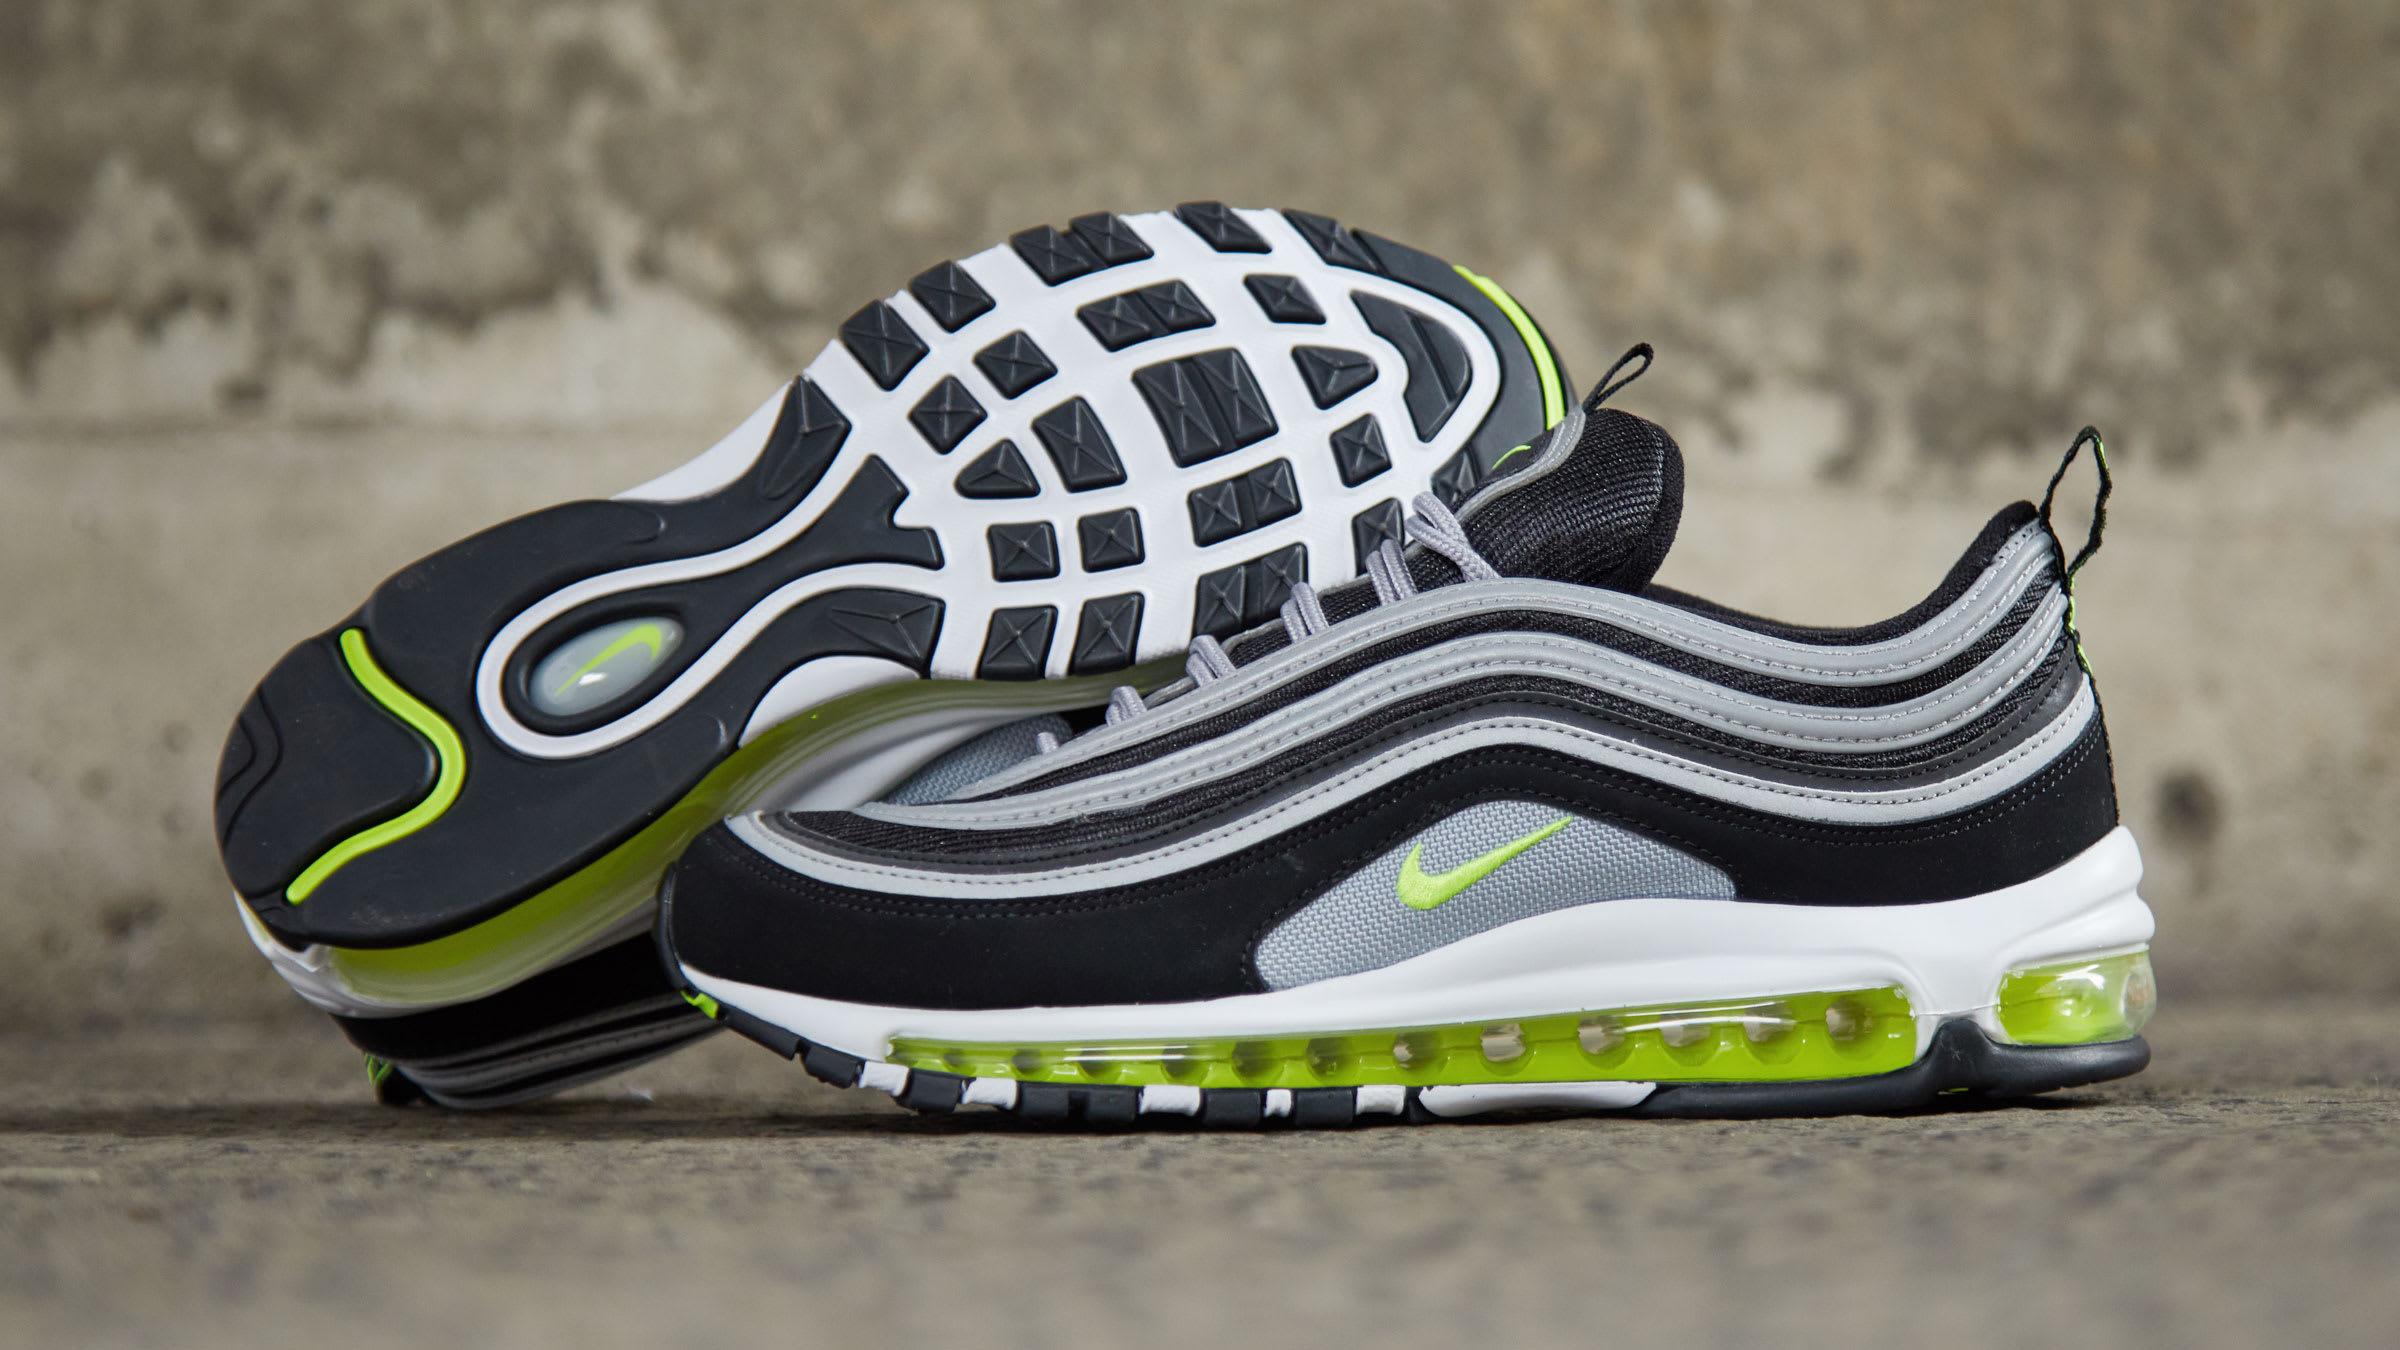 new products 8451c 18c0f Nike Air Max 97 Japan OG. Black, Volt ...